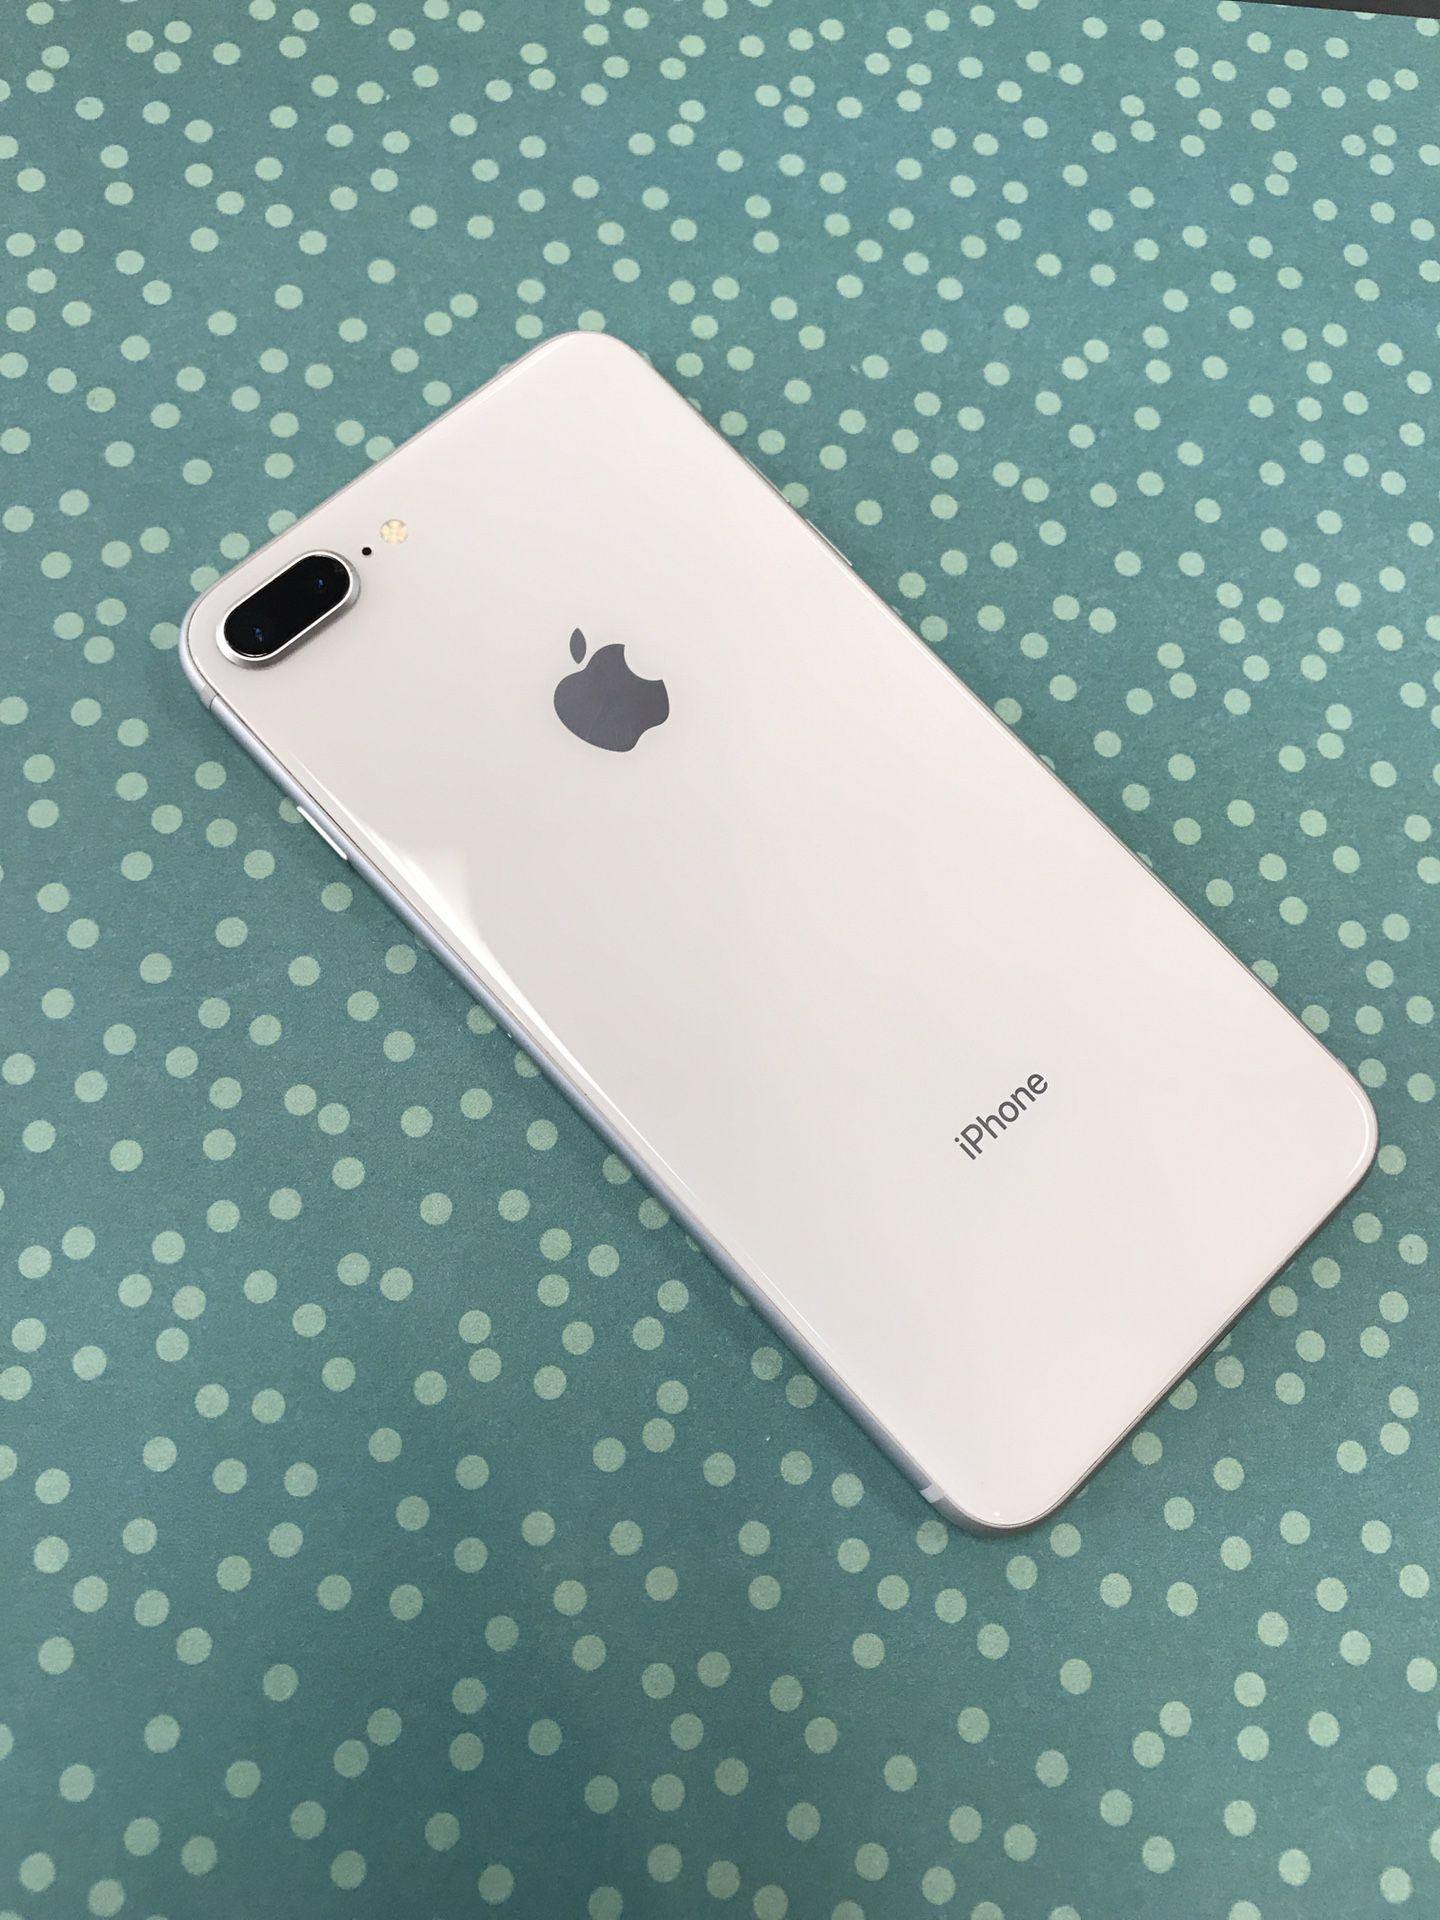 iPhone 8 Plus 64GB Unlocked Excellent Condition